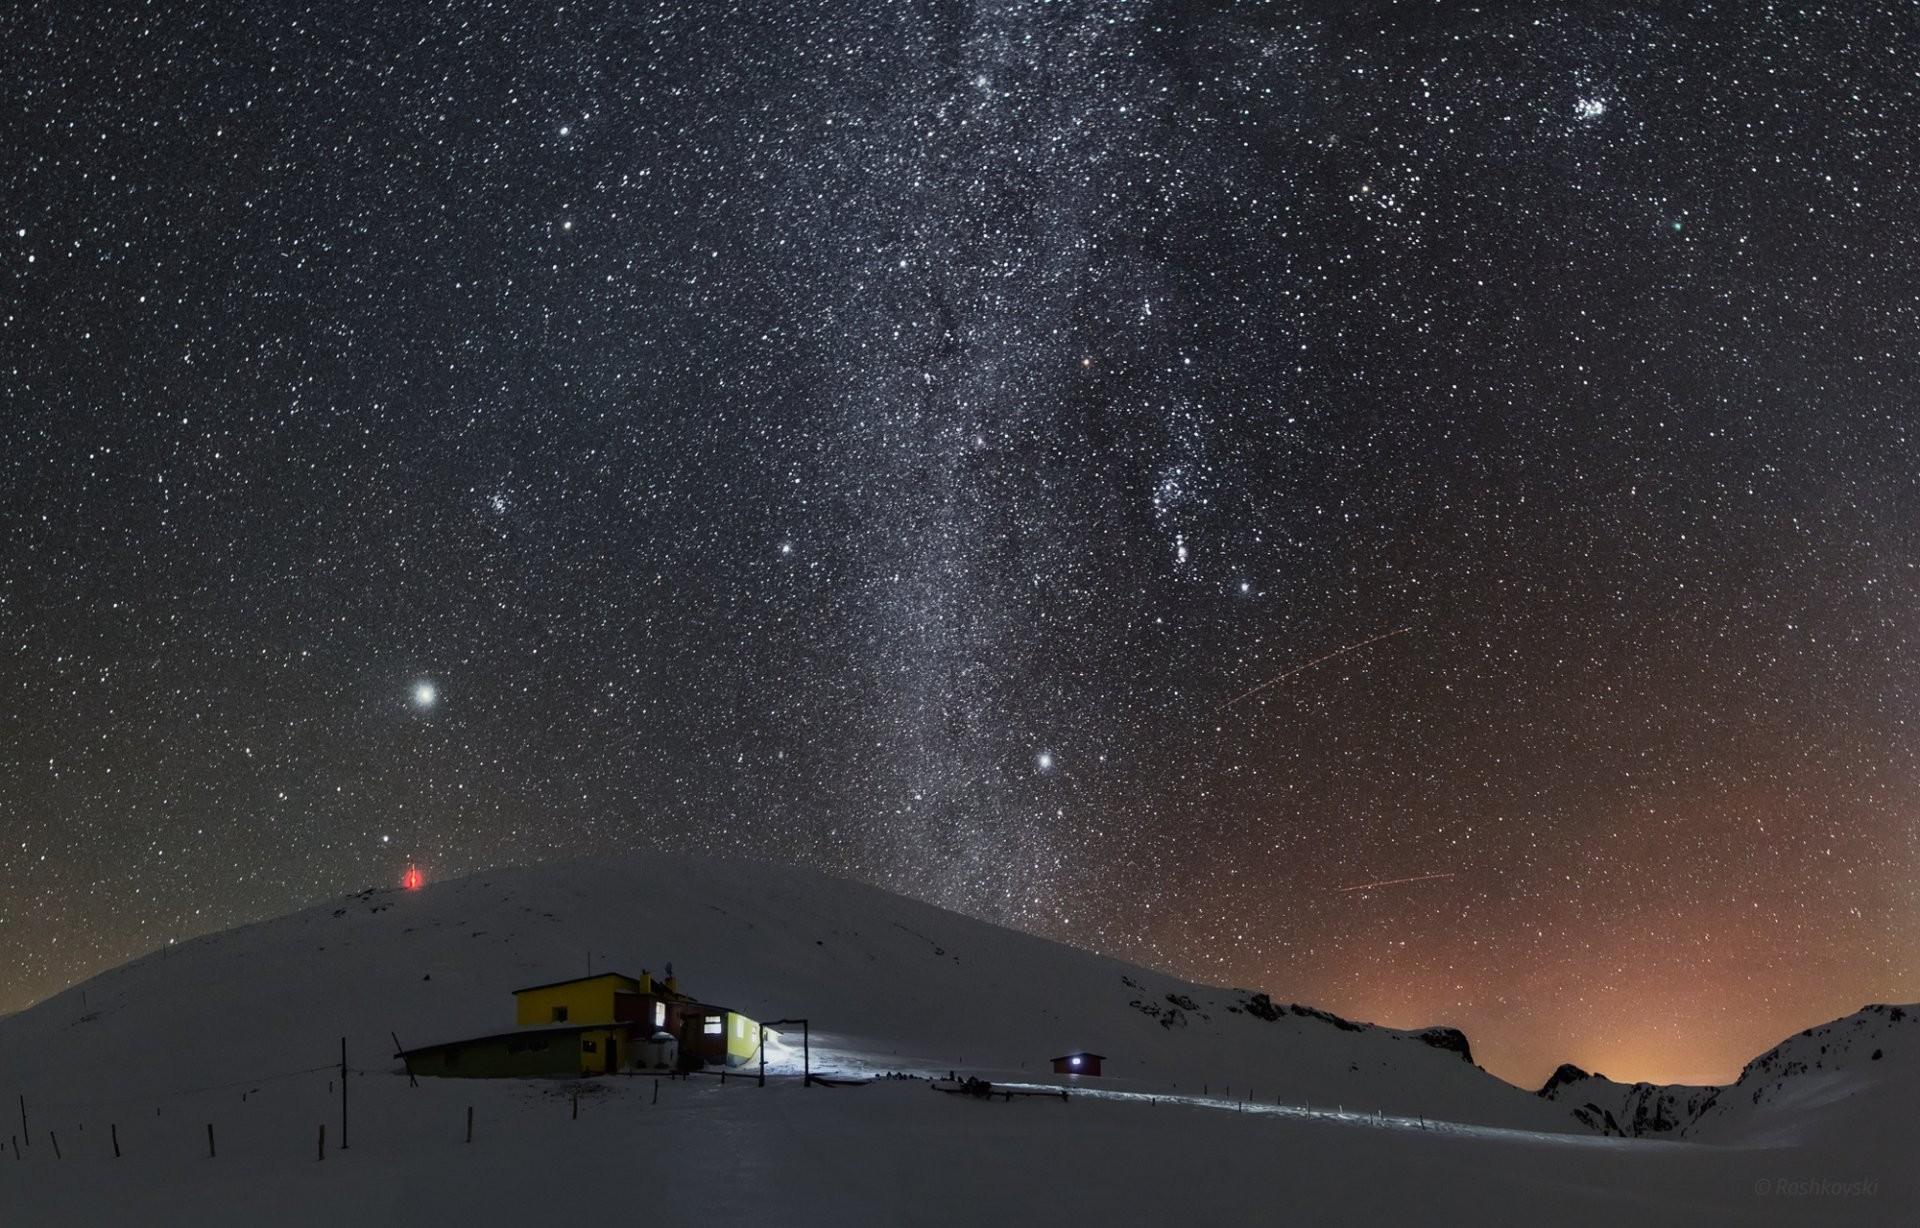 winter snow mountain weather station night sky star